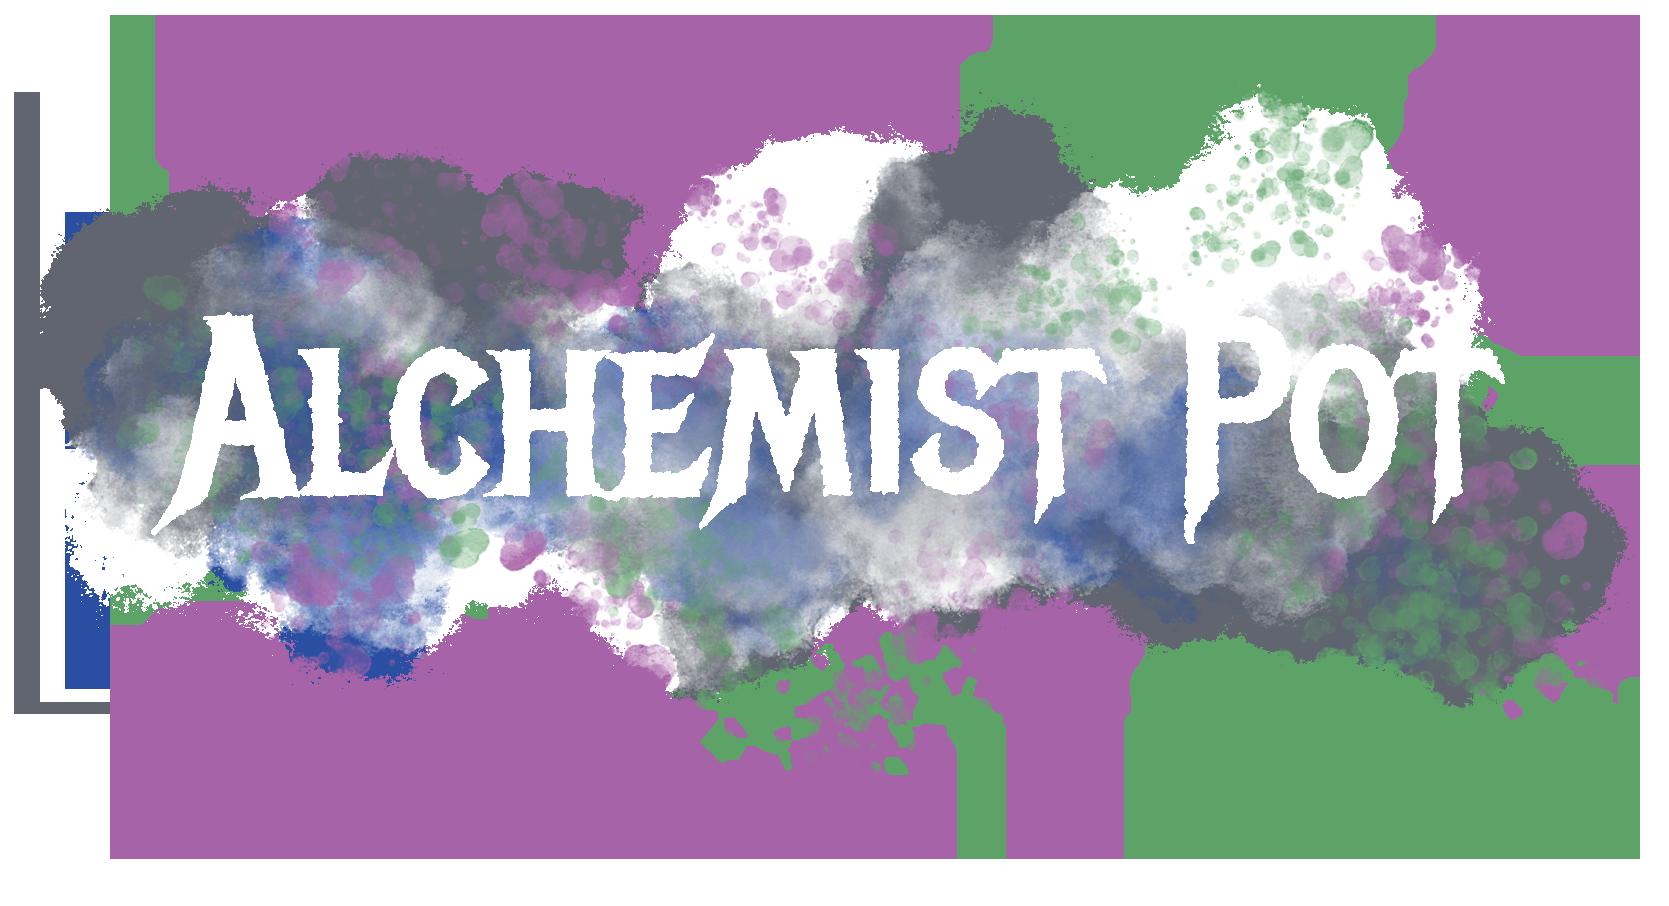 Alchemist Pot